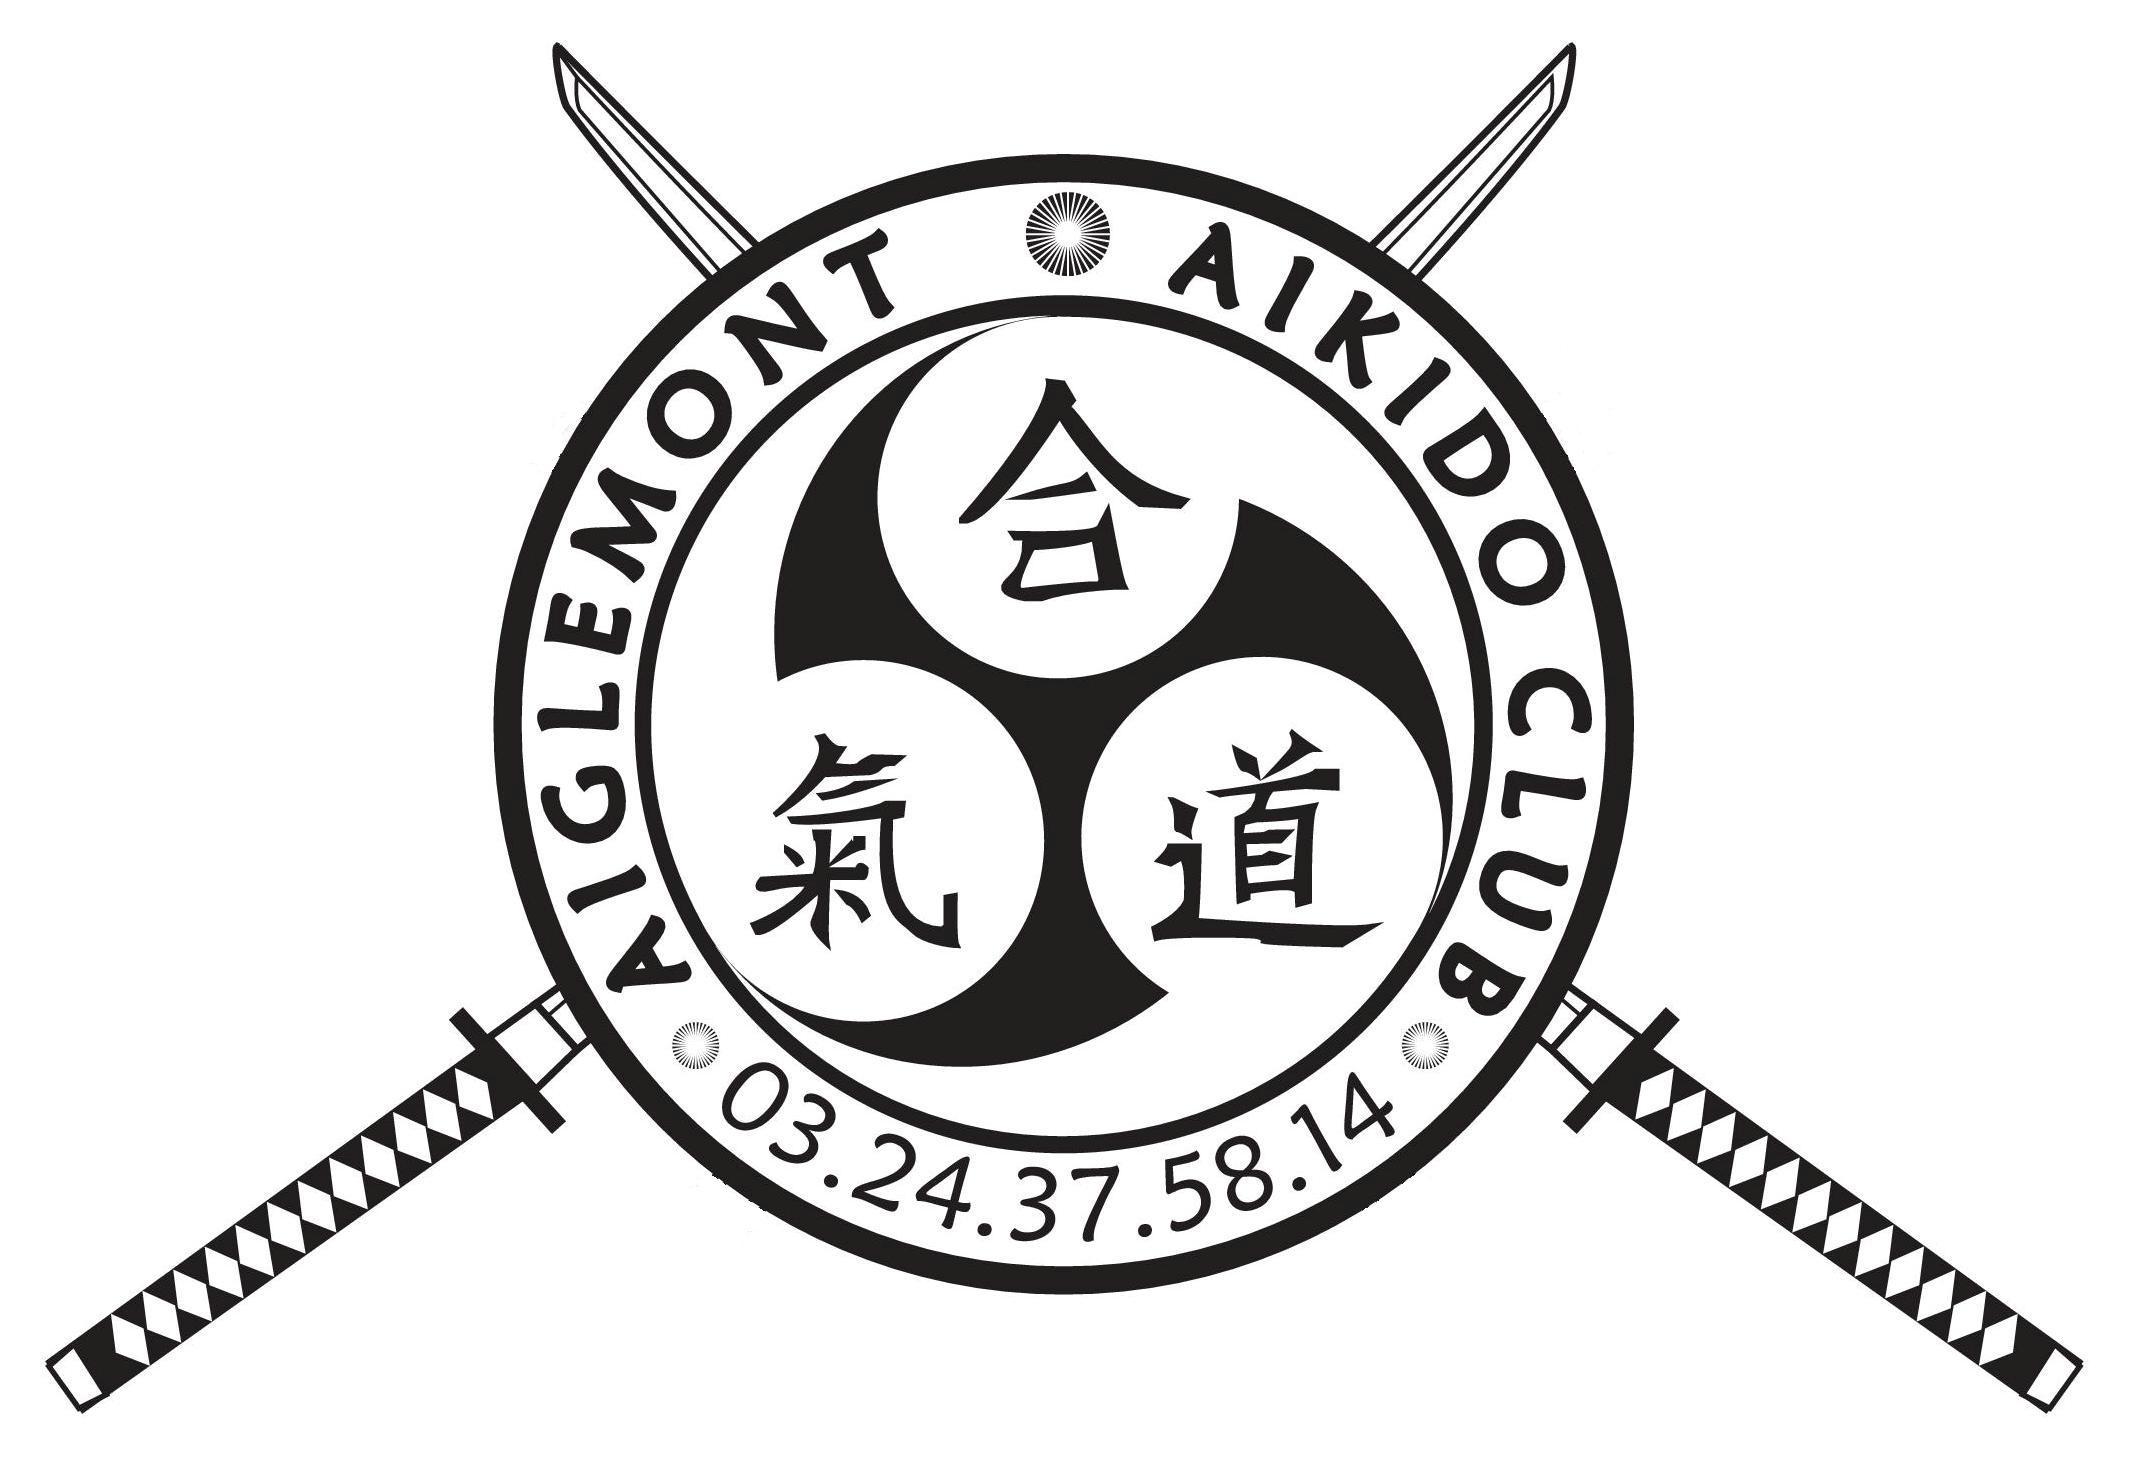 Aikido Aiglemont Club